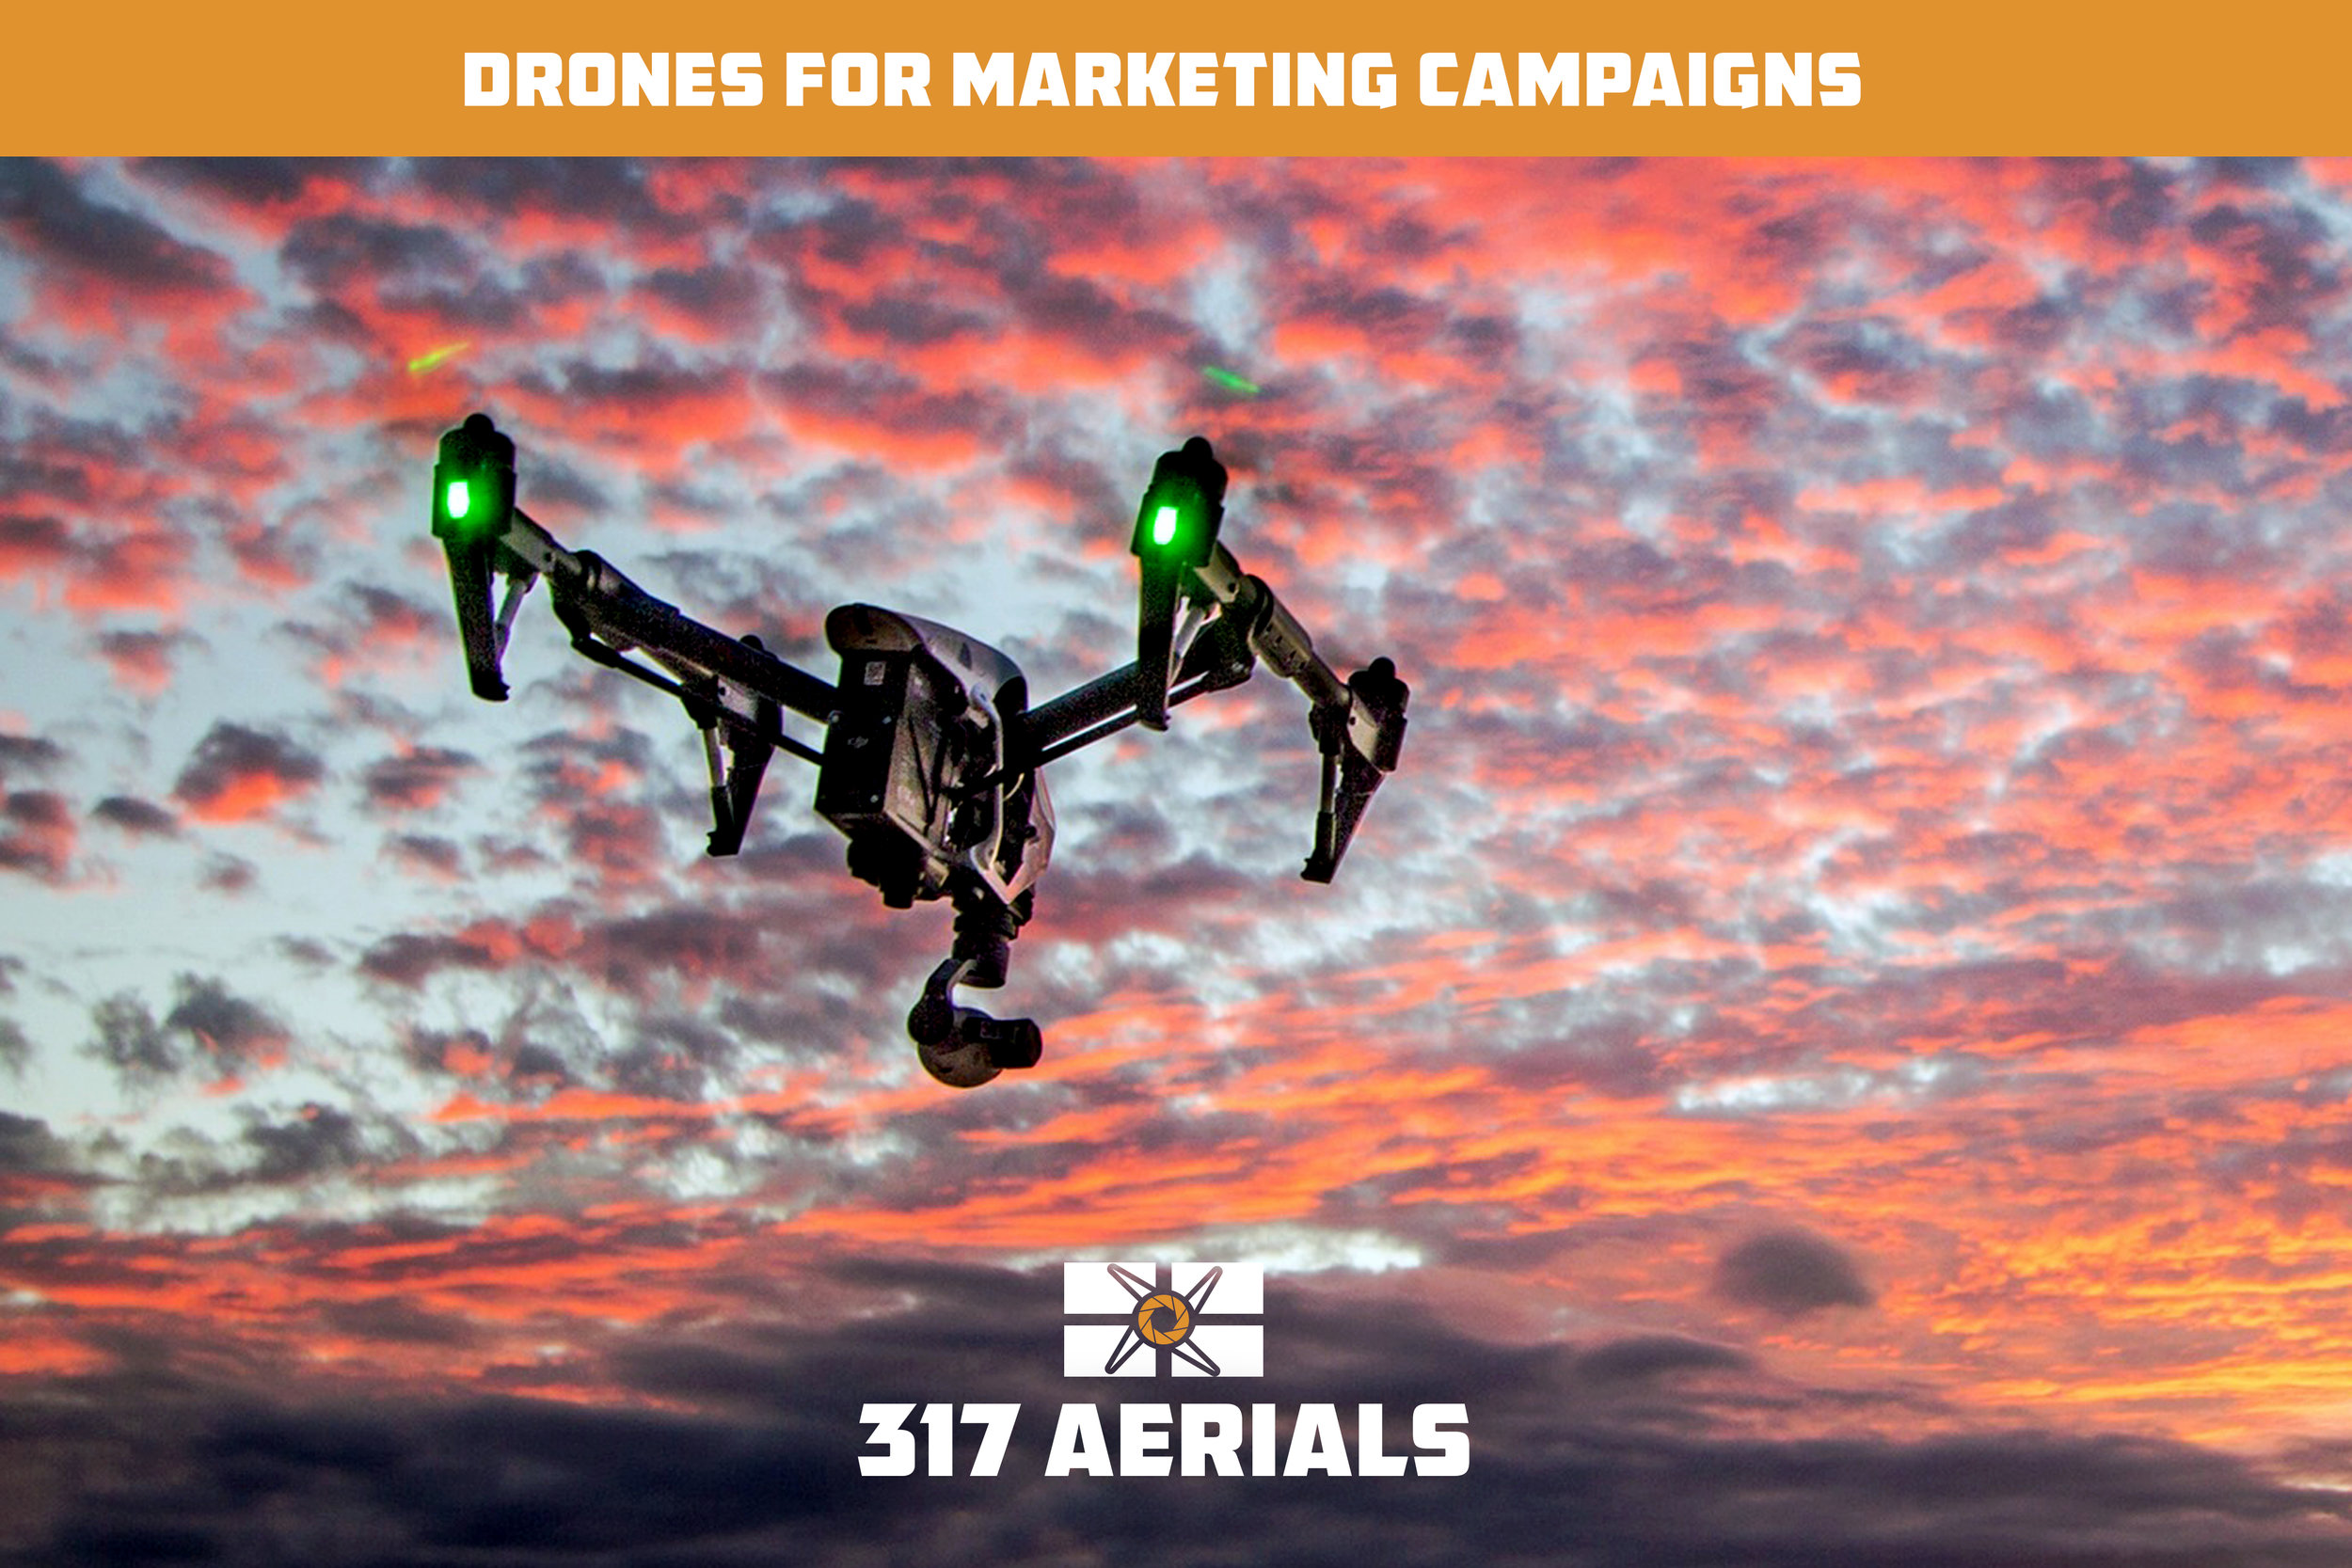 marketingdrones.jpg